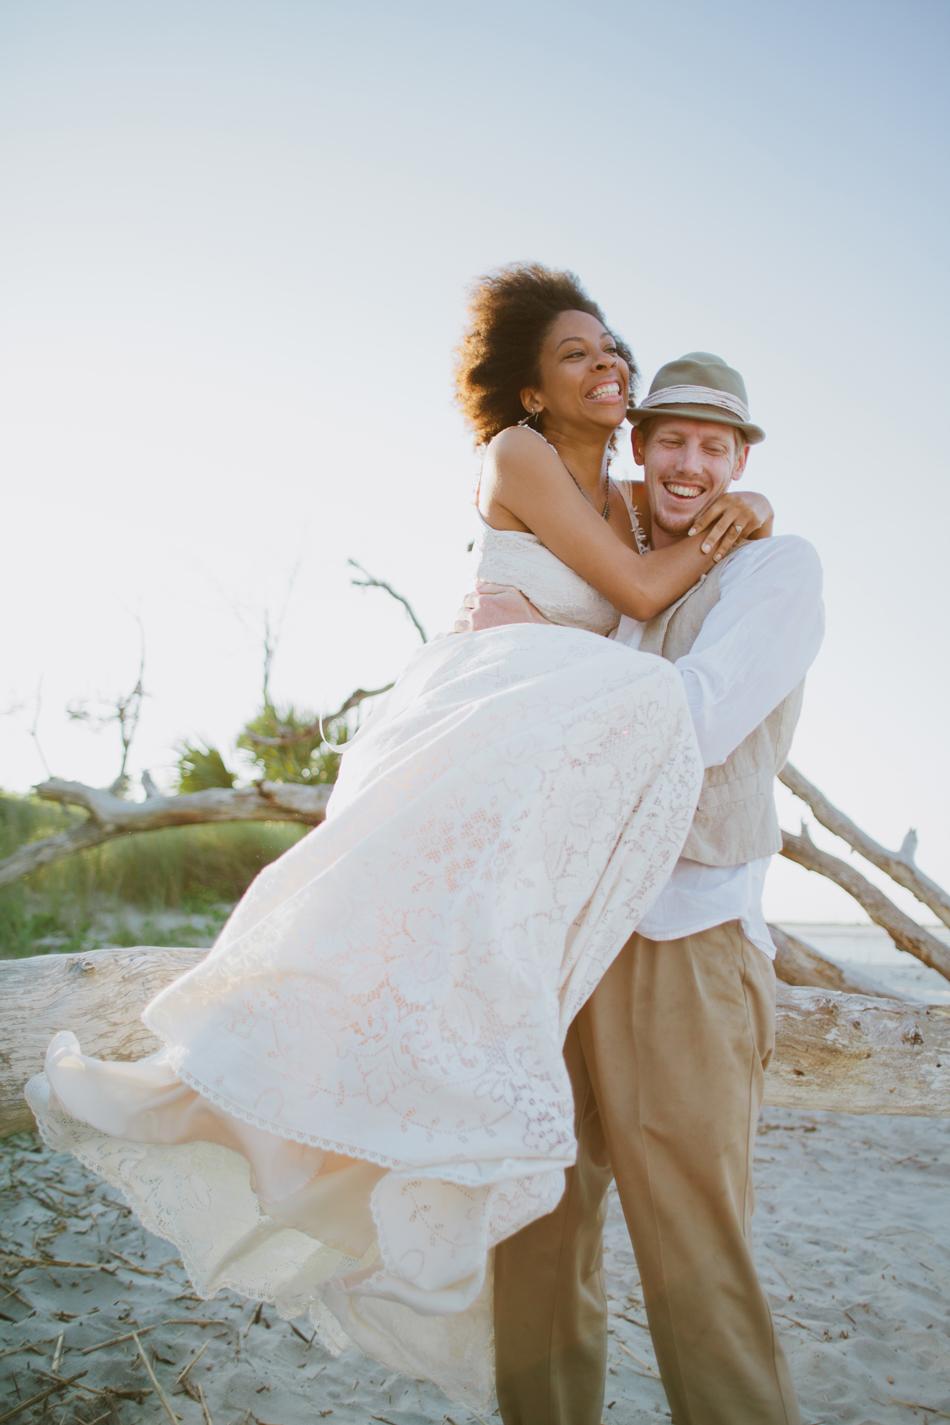 Jameykay_arlie_bohemian_elopement_styled_shoot037.jpg